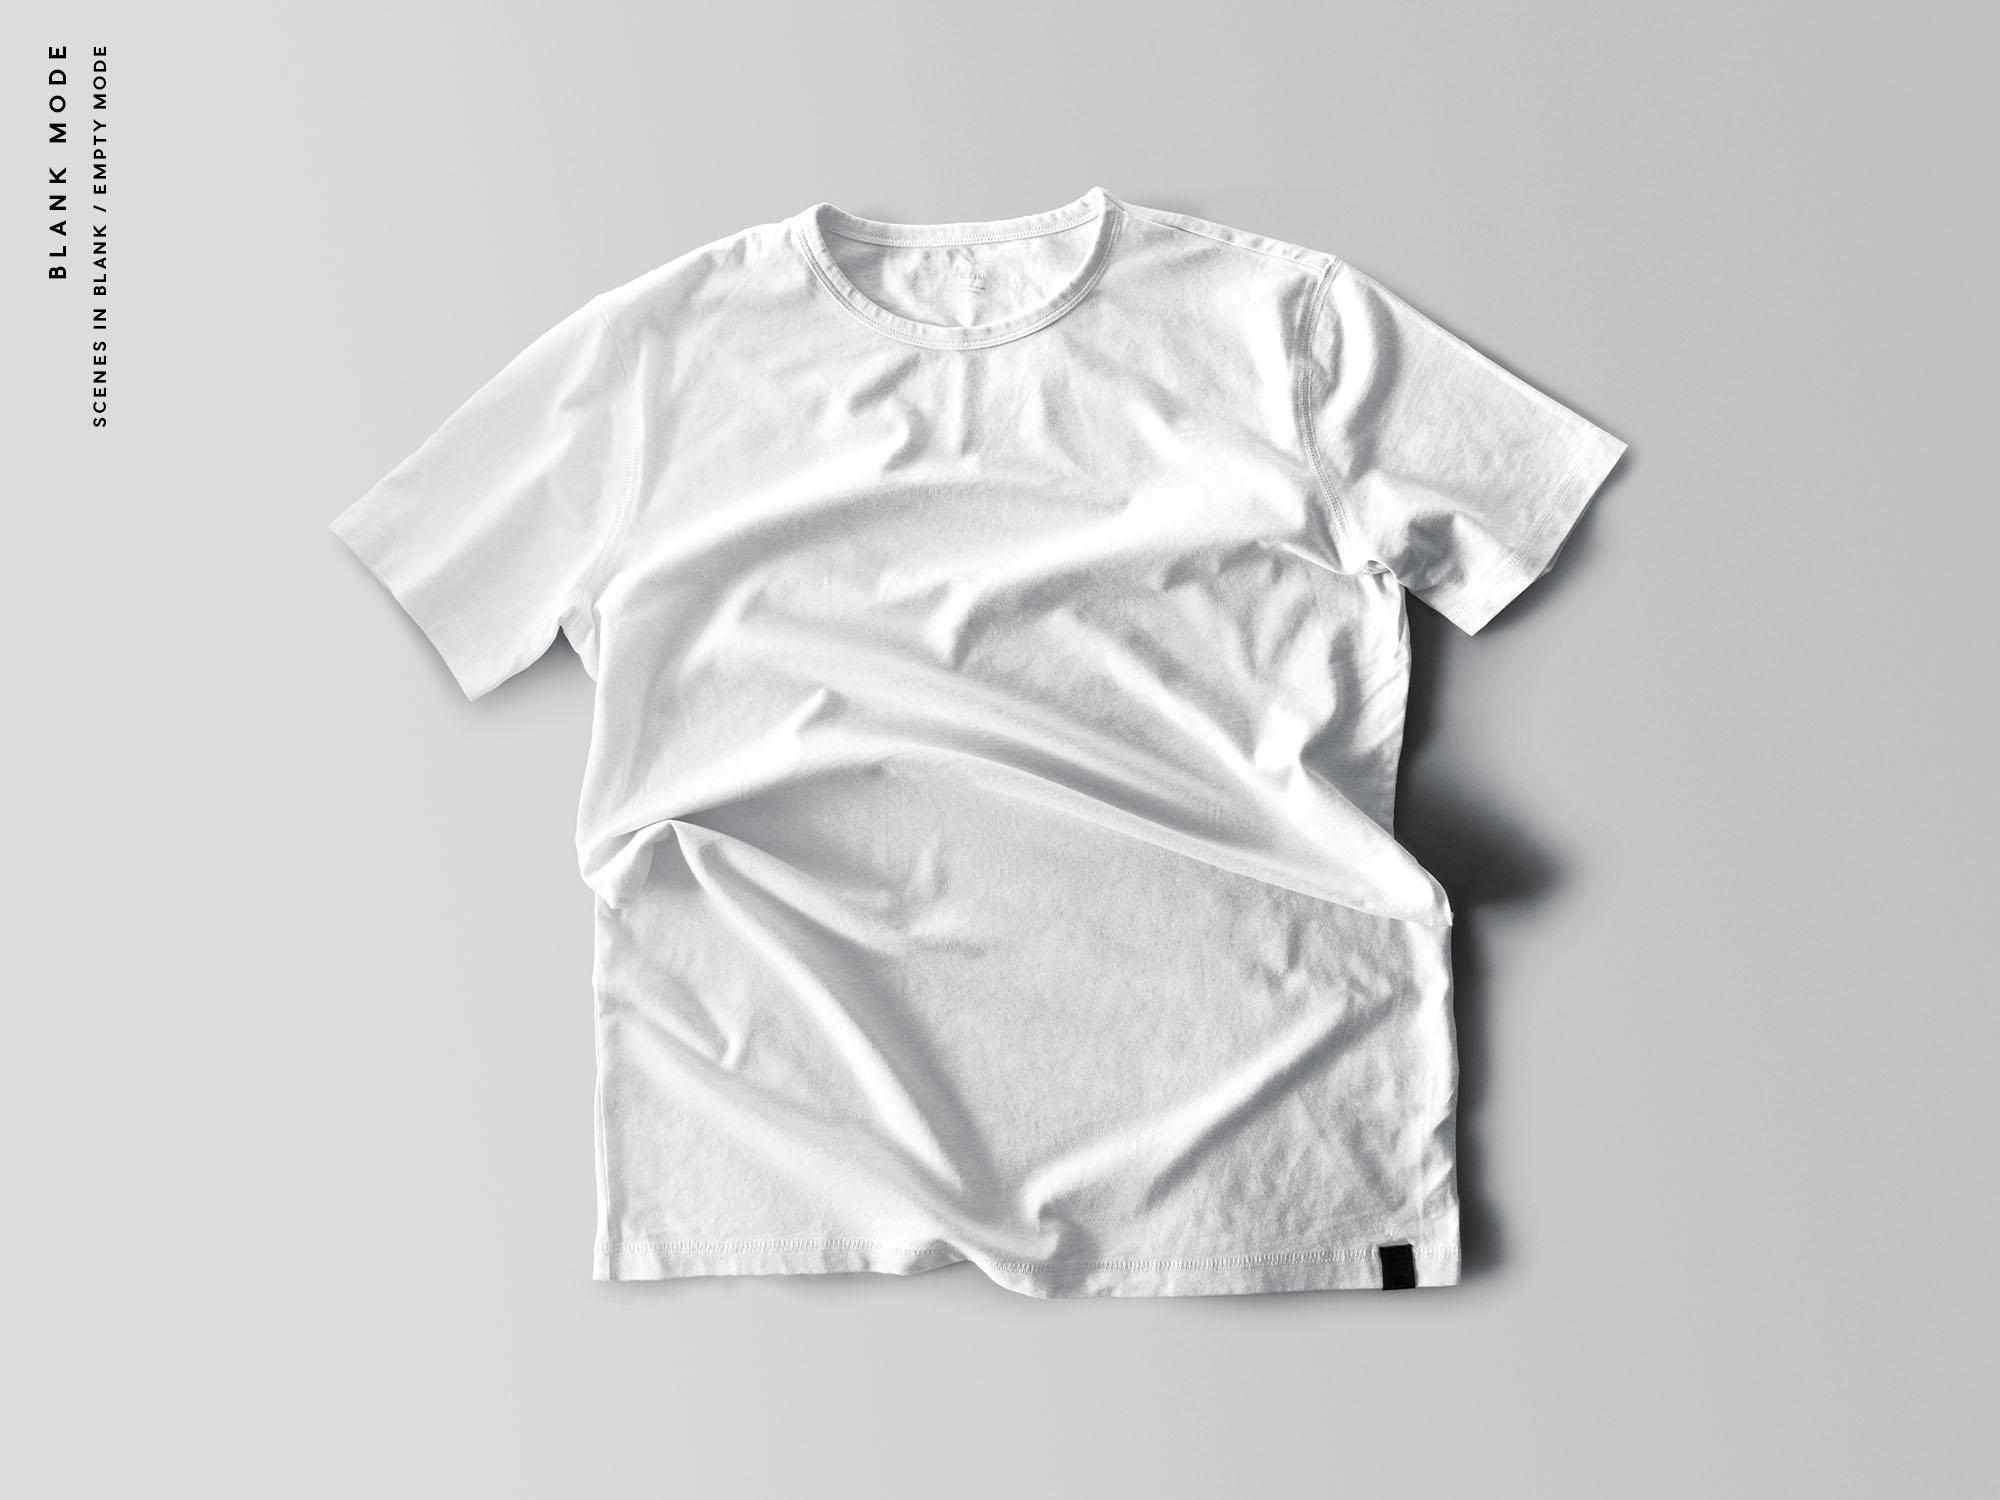 T-Shirt Mockups Blank Mode